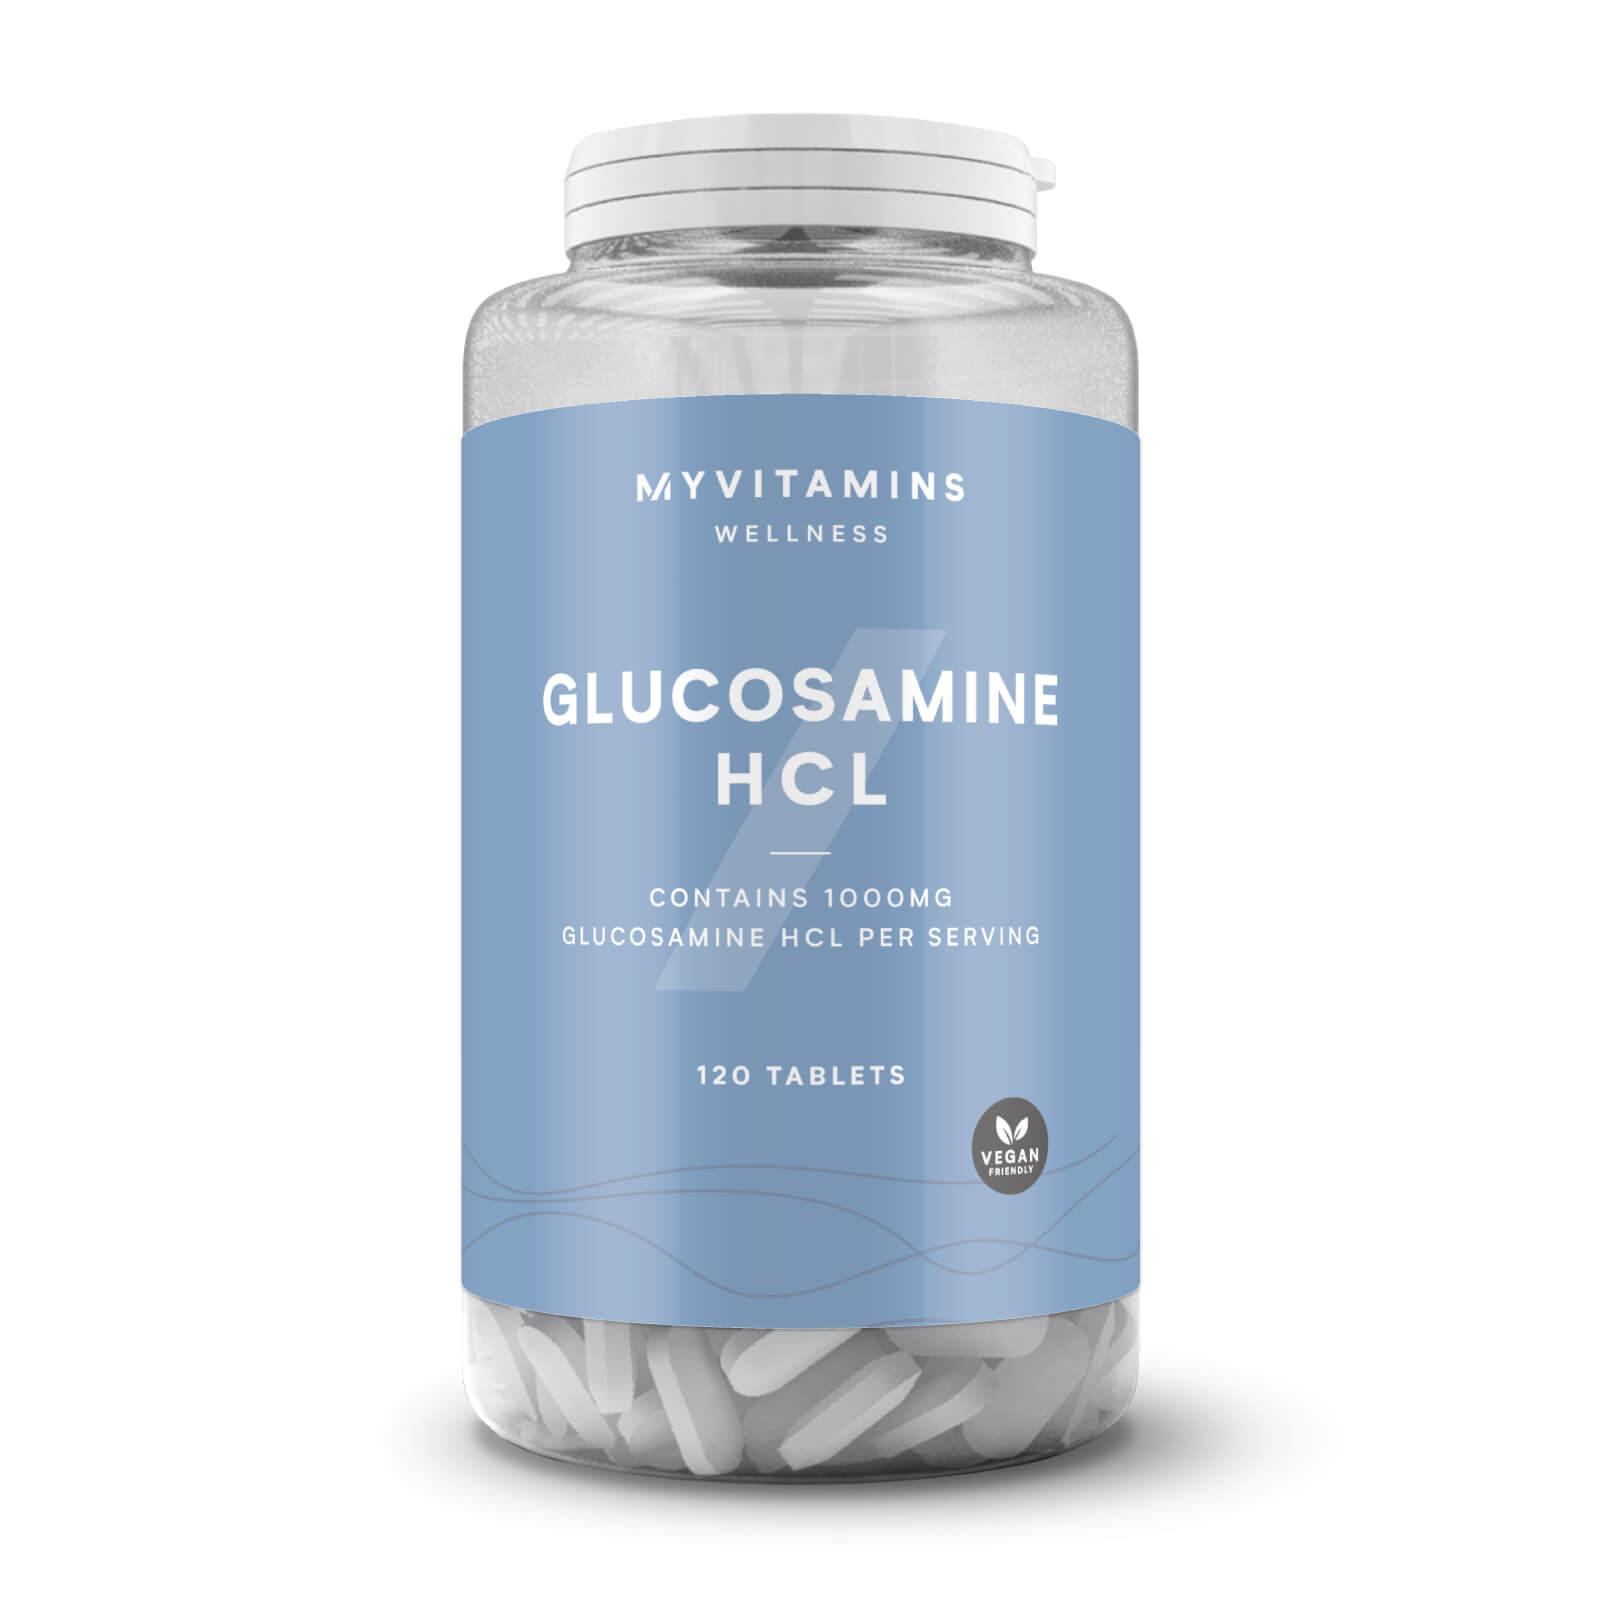 Купить Гидрохлорид глюкозамина - 120таблеток, Myprotein International